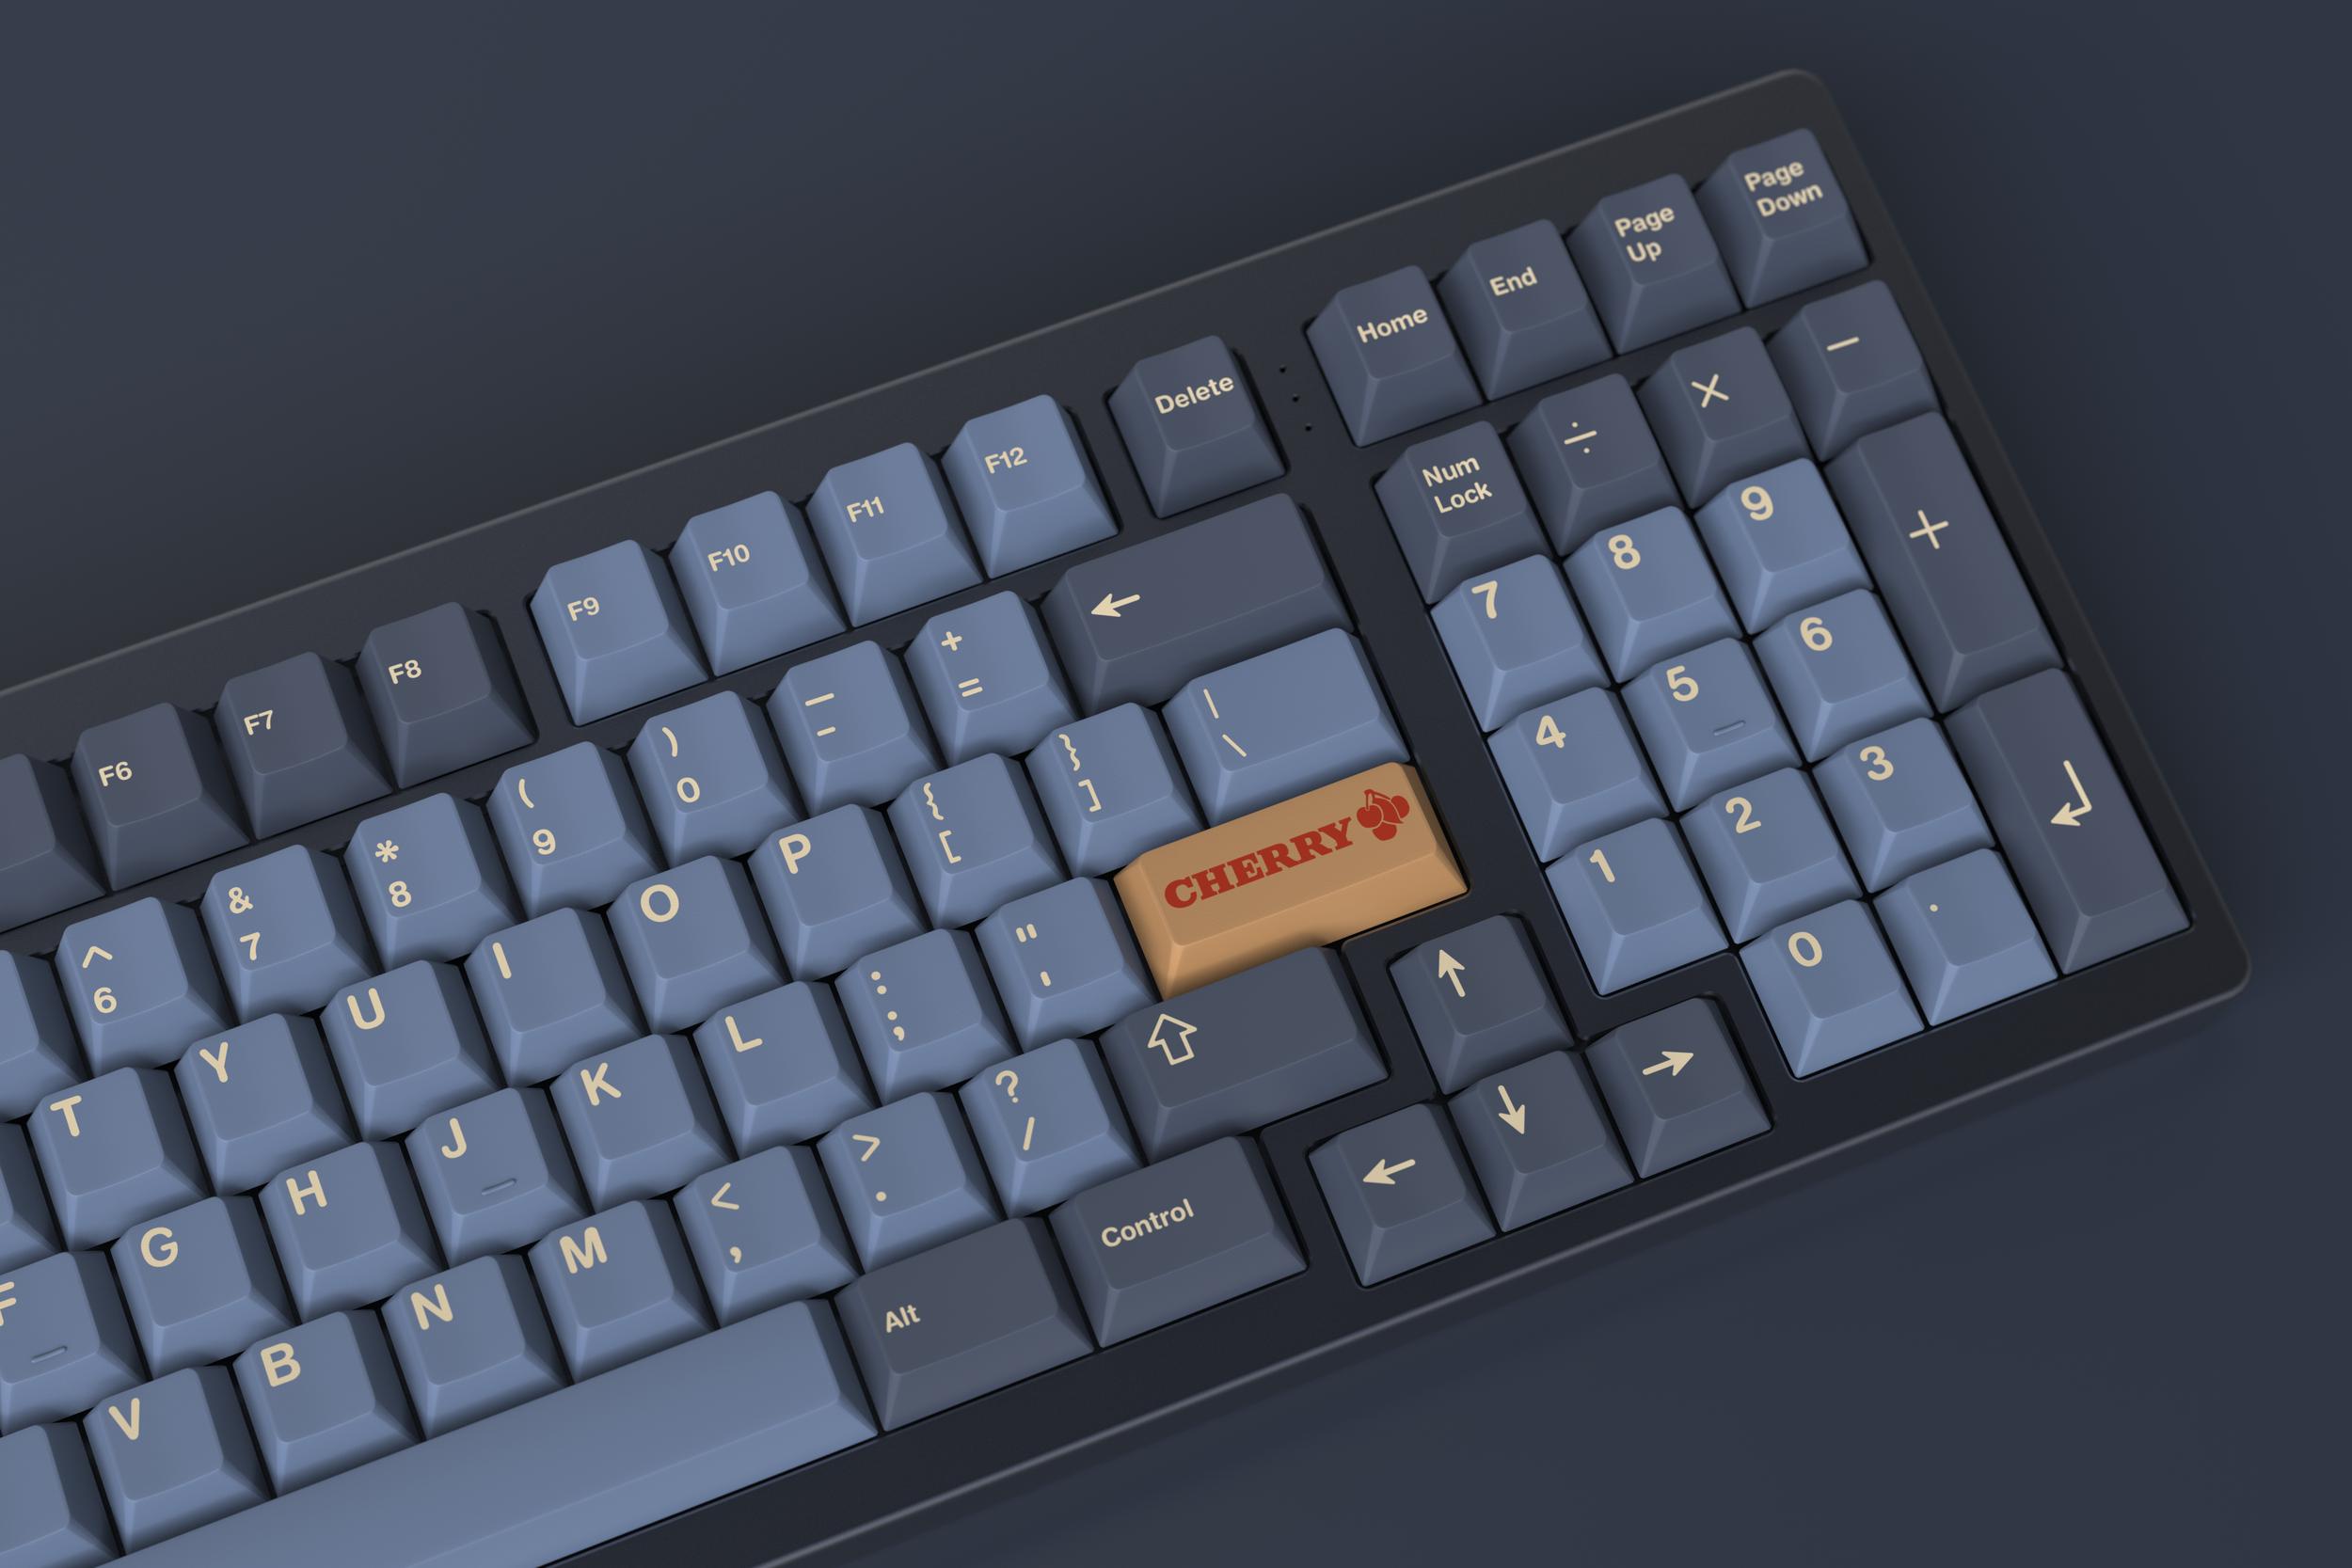 gmk_denim_keyboard_andromeda_ortho_top.png